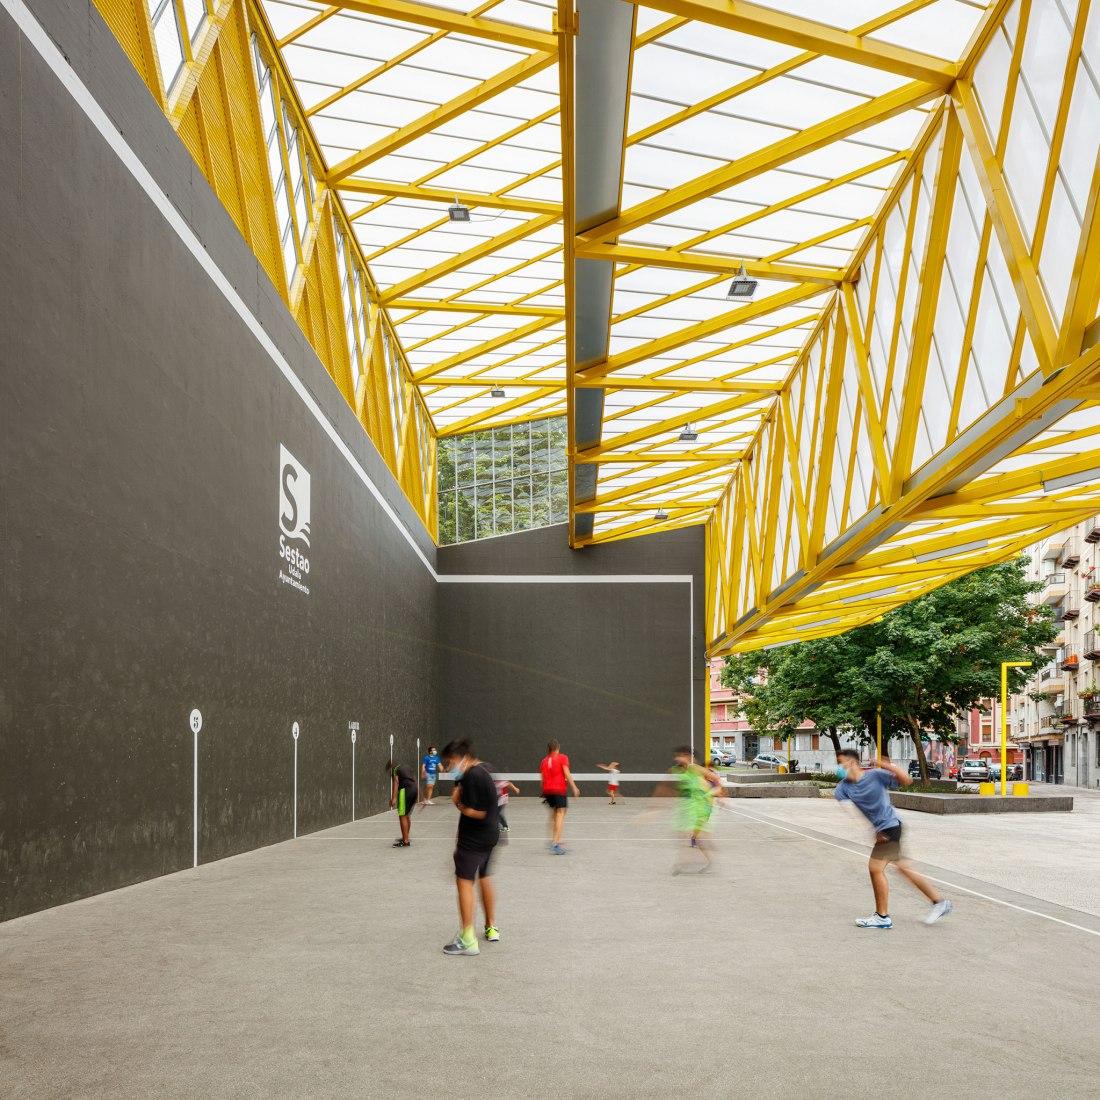 El Sol square by ELE arkitektura + TARTE. Photograph by Aitor Estevez.